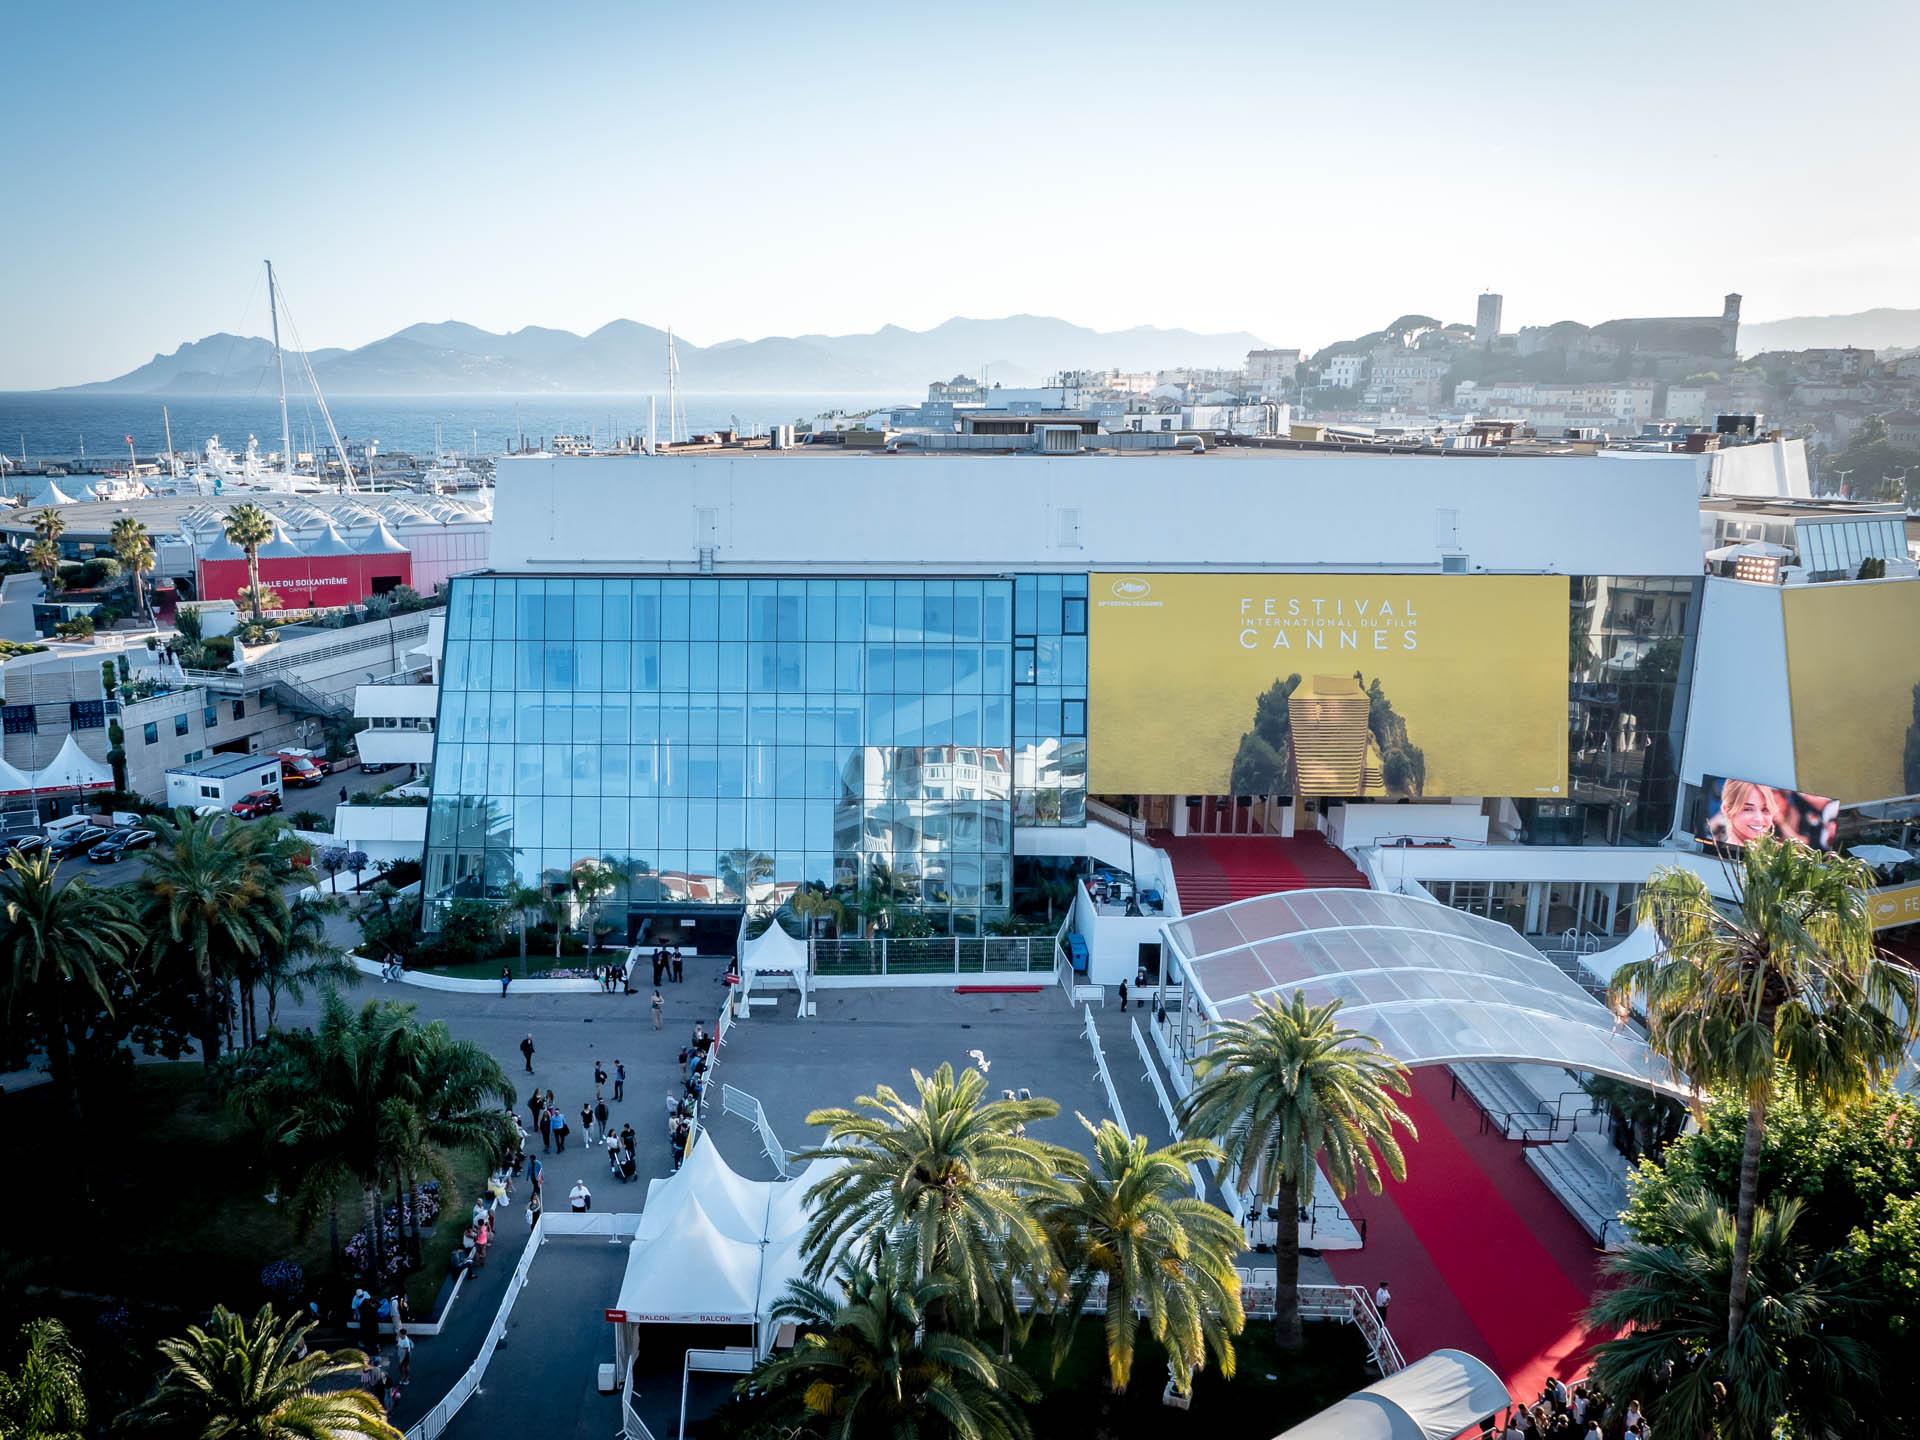 Cannes Film Festival Roter Teppich Schweizer Blog-2